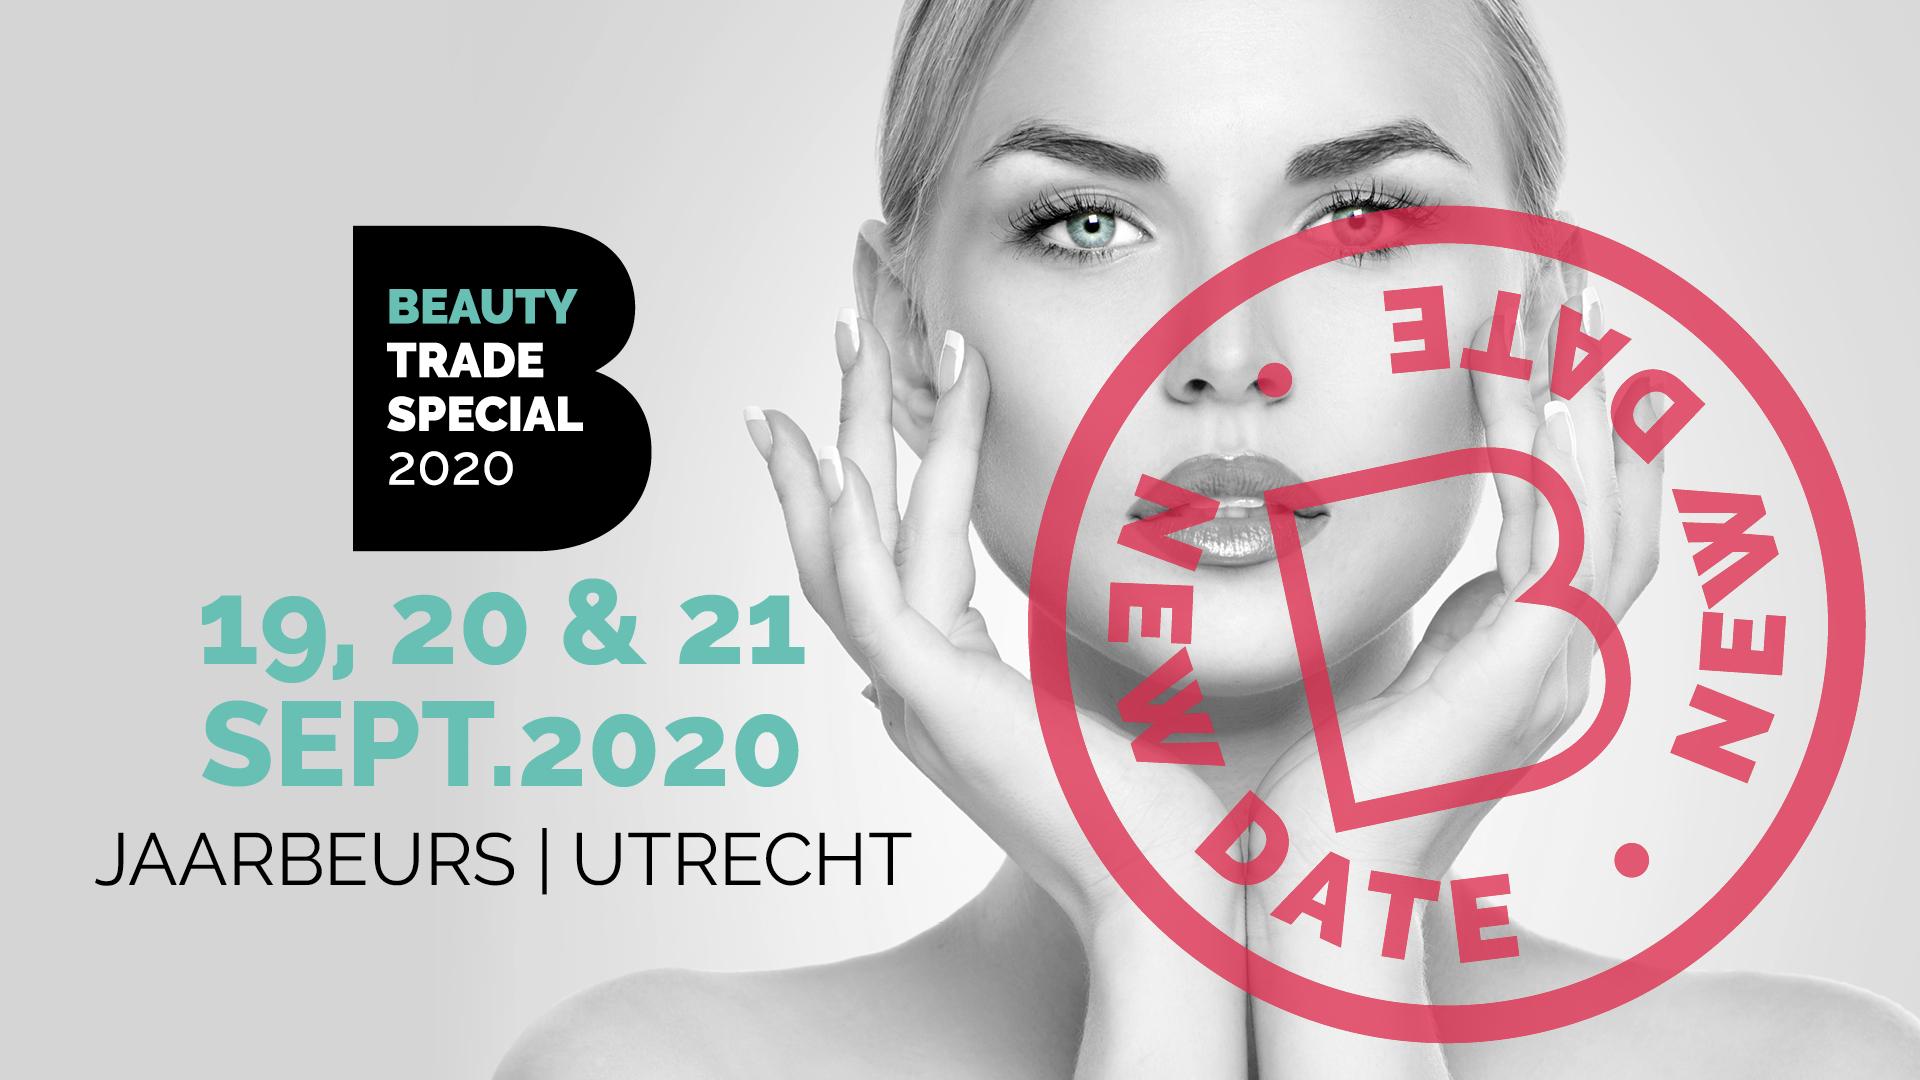 Beauty Trade Special Utrecht -  19, 20 & 21 September 2020